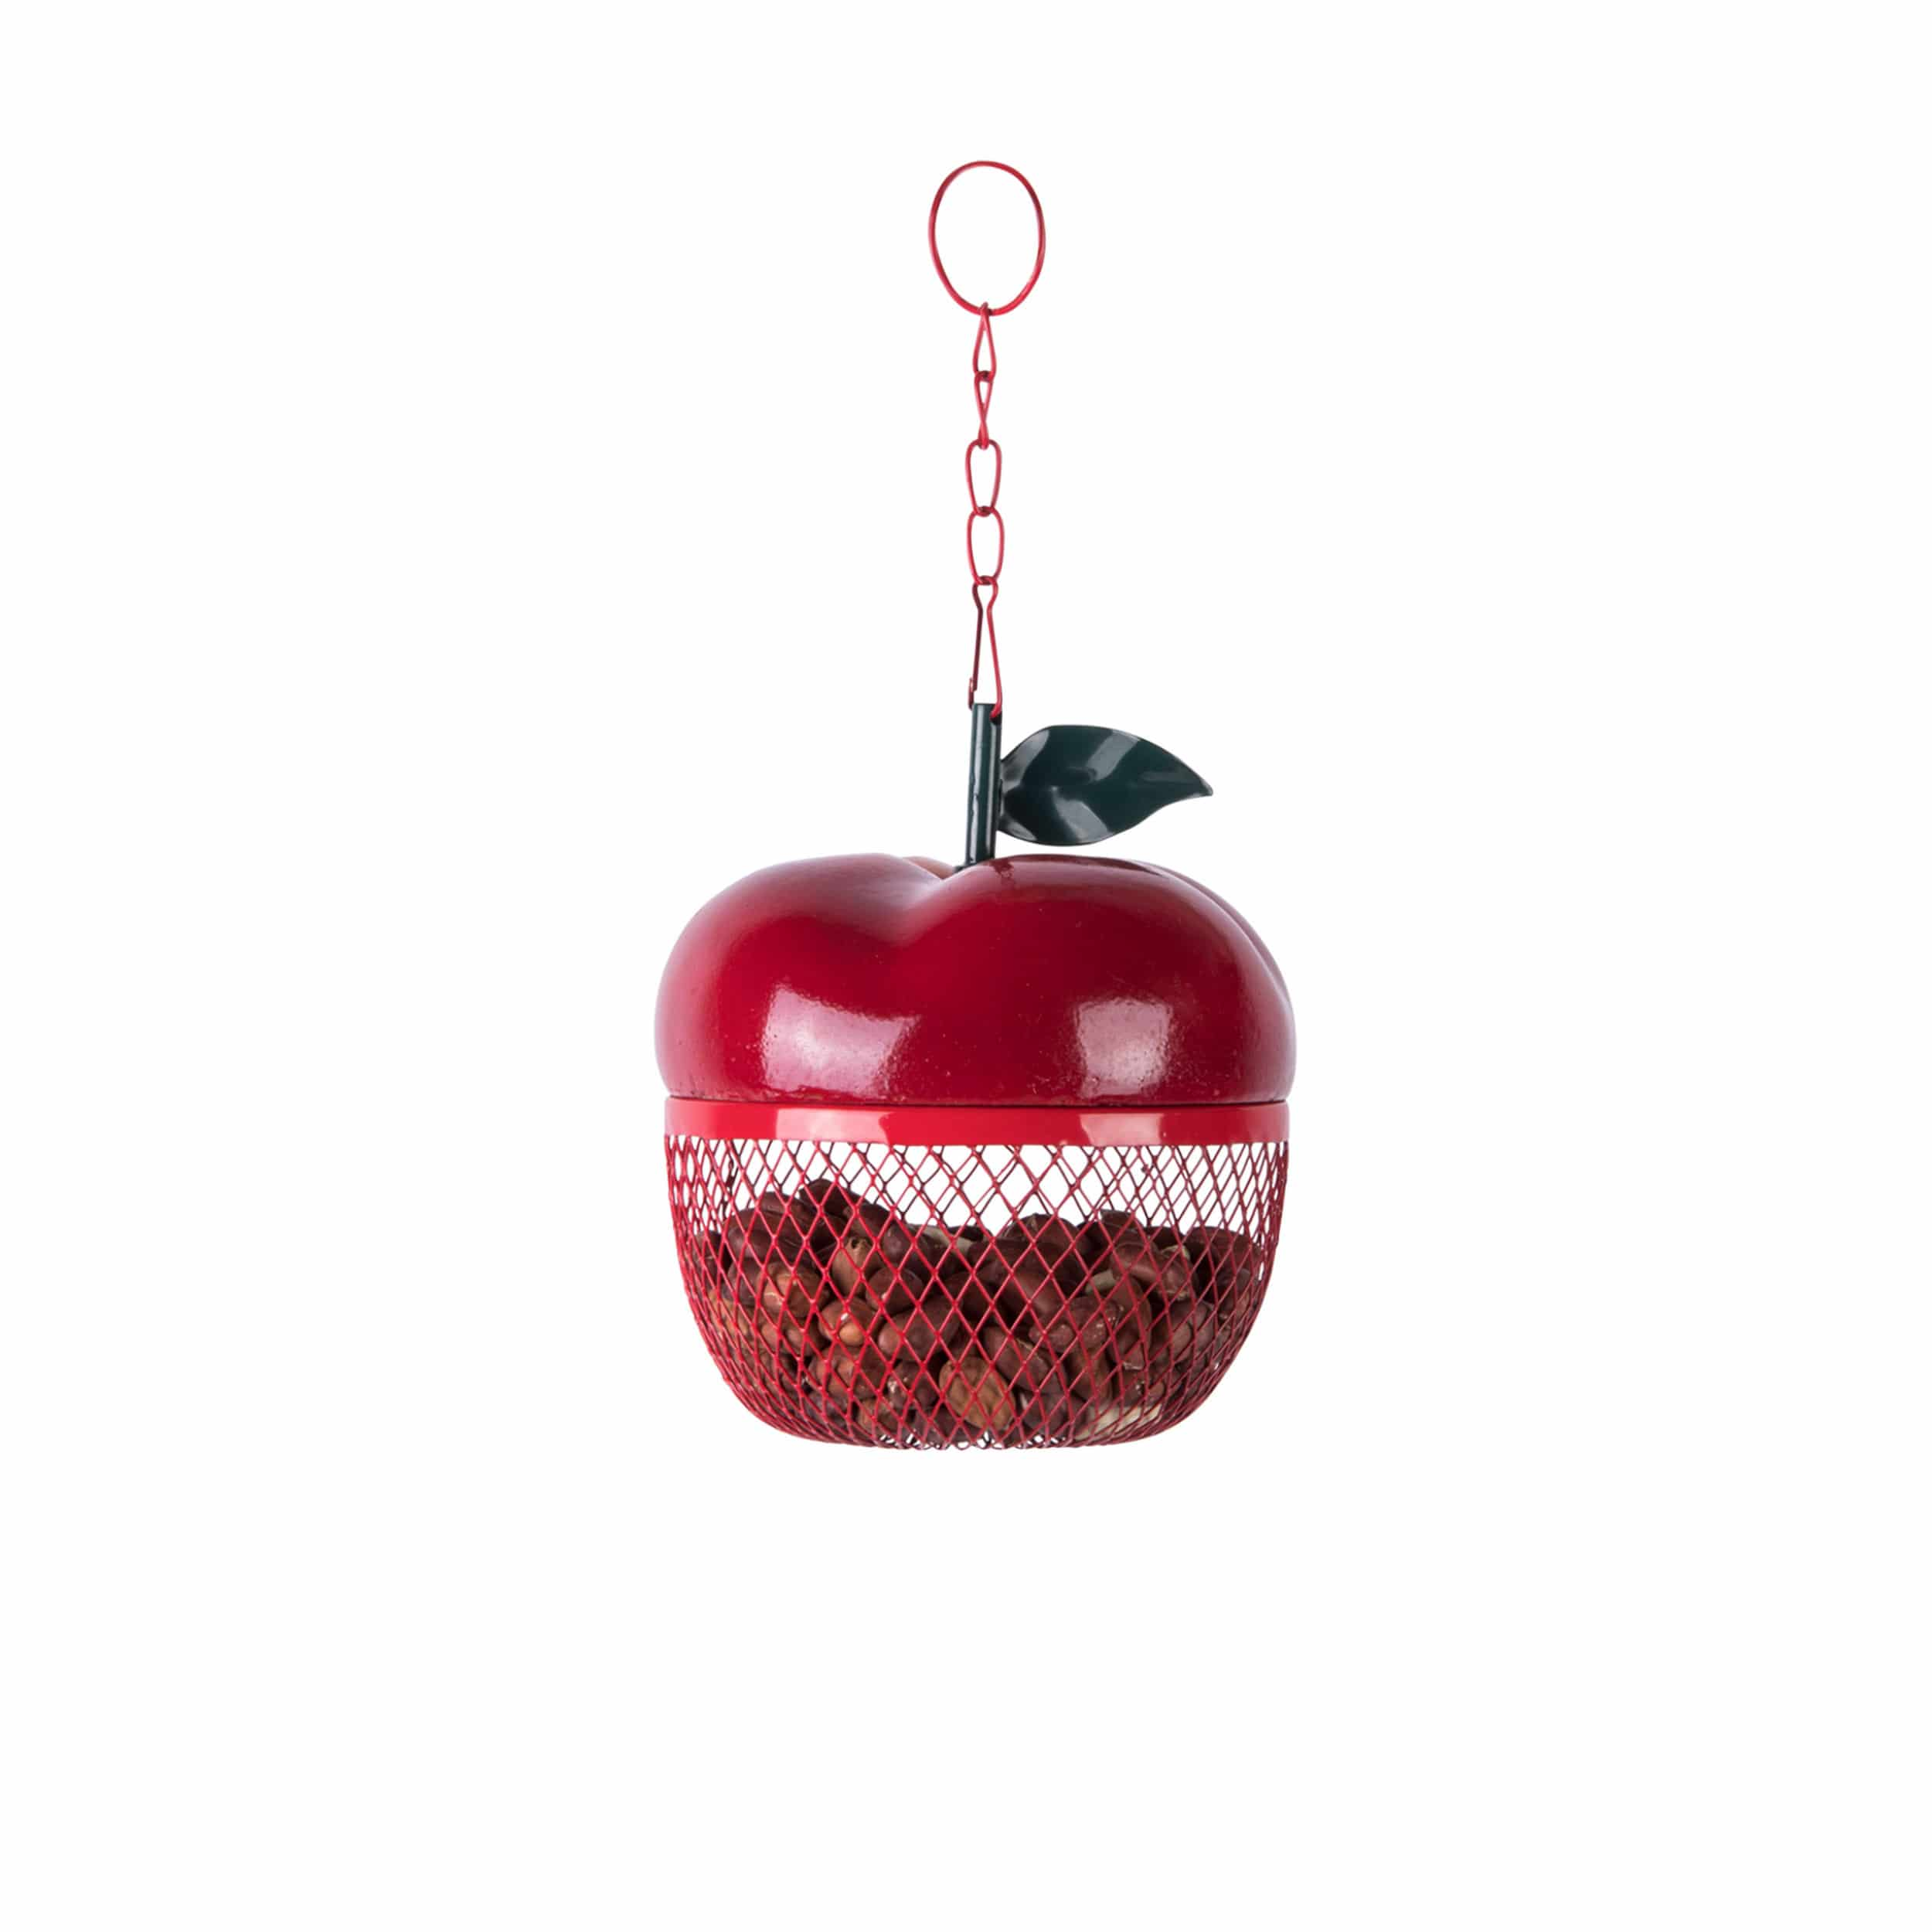 Vogelfutterhänger Apfel